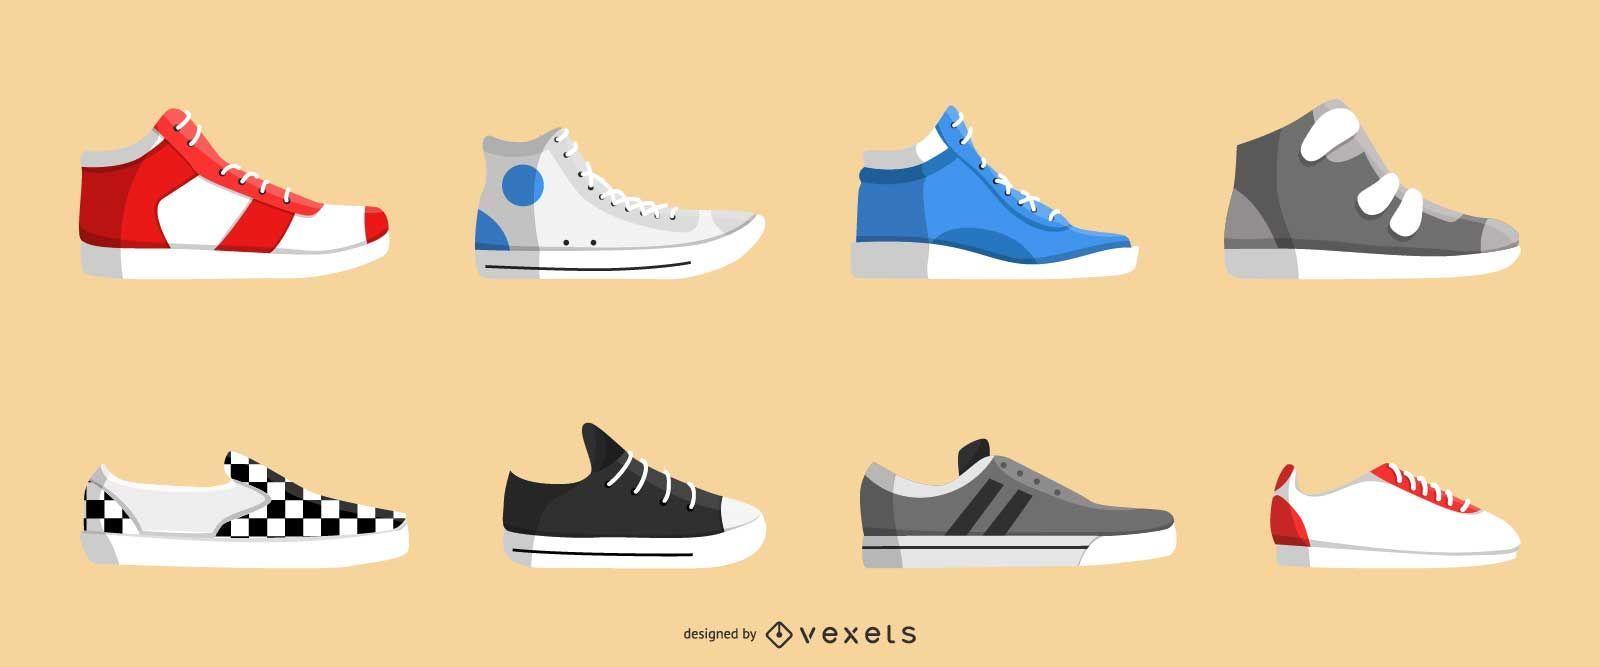 Realistic sneakers icon set